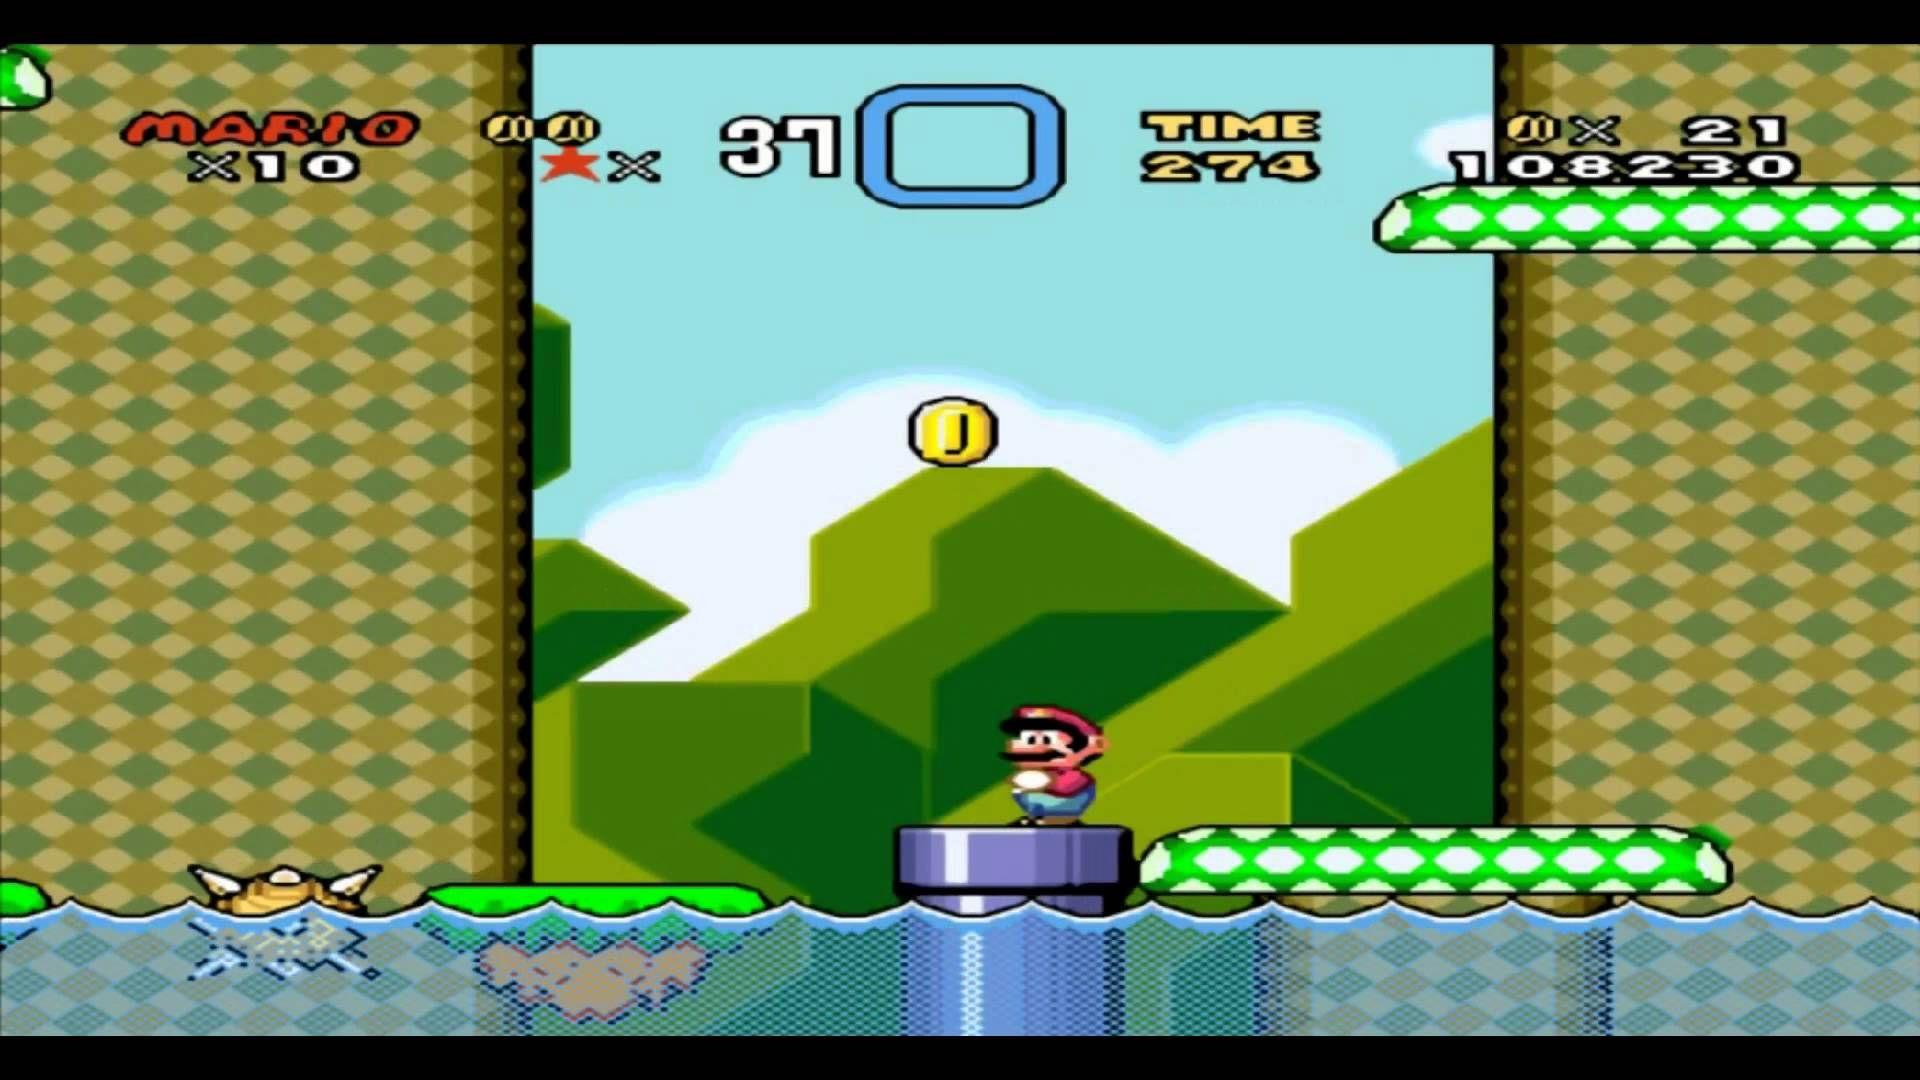 Super Mario World Gameplay 1080p on SNES9x (Area 1) (+